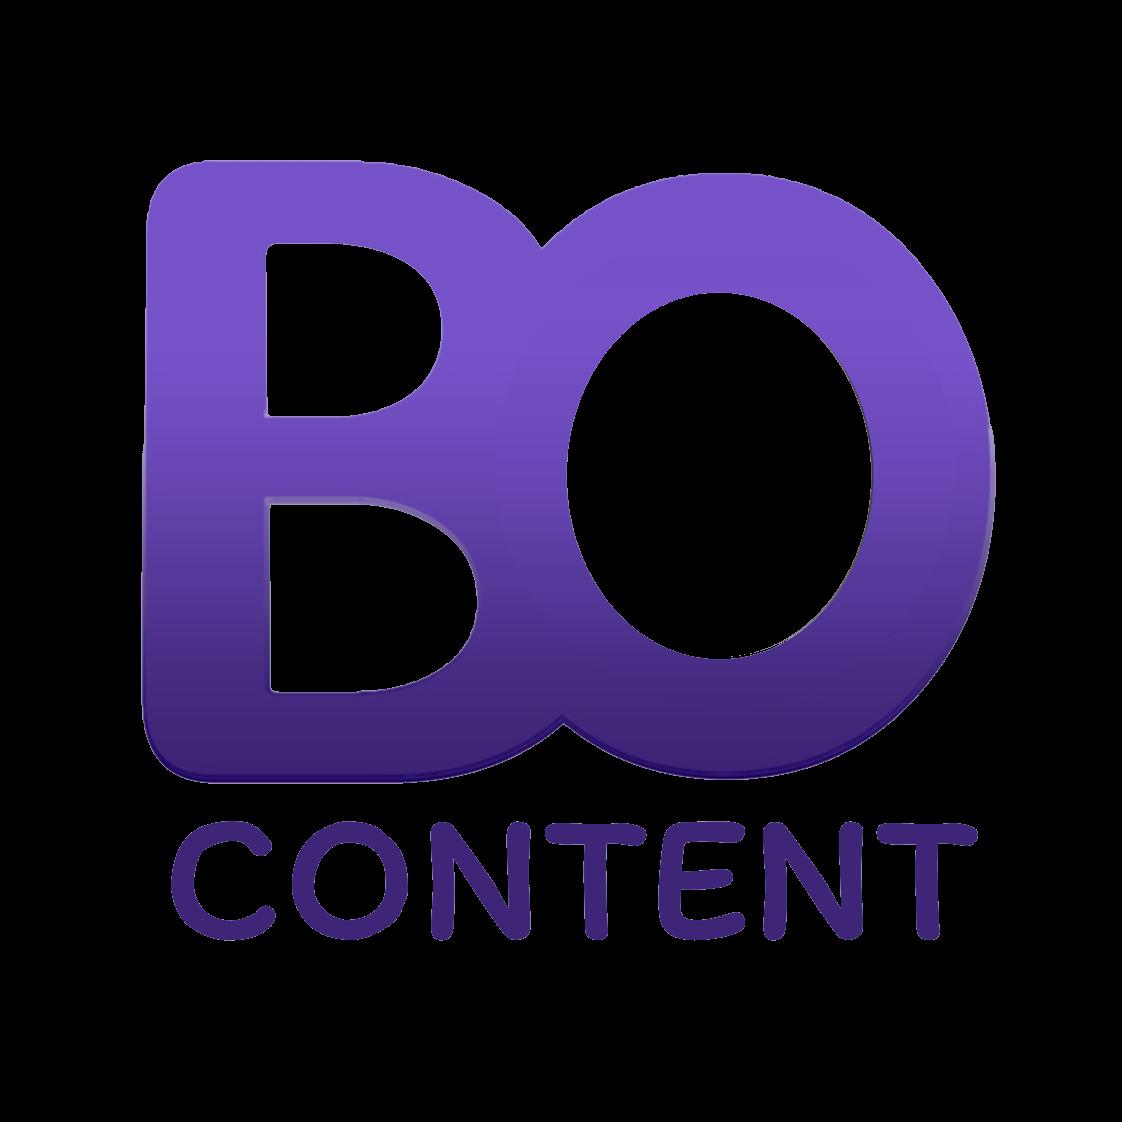 BO Content